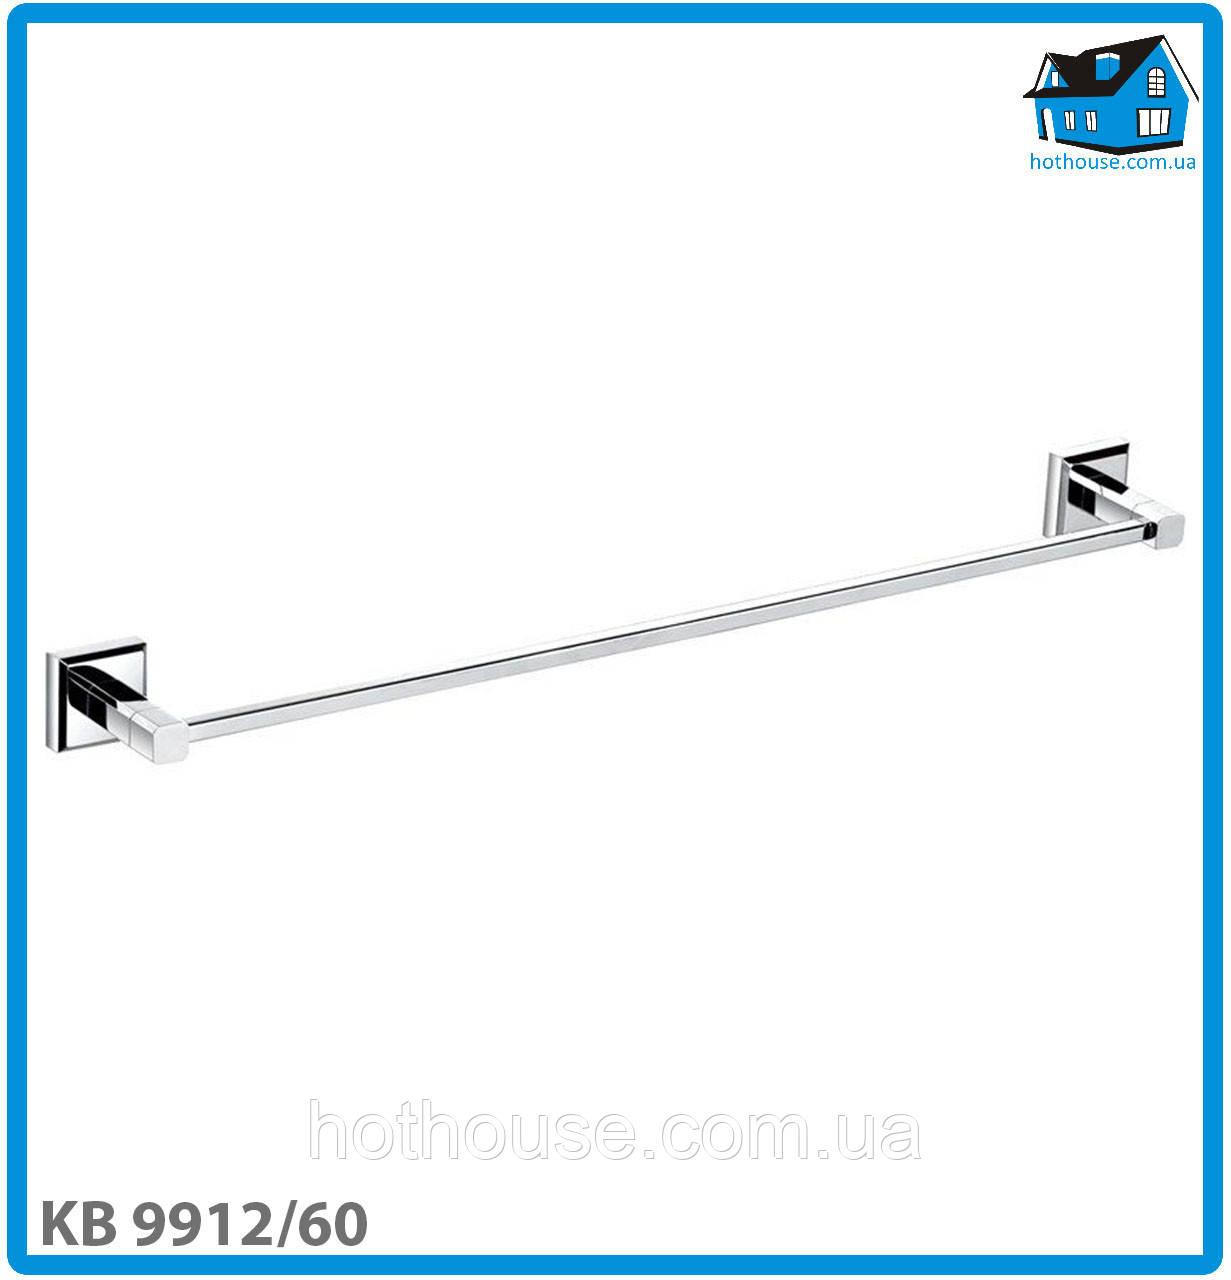 Держатель для полотенца Perfect Sanytary Appliances KB 9912/60